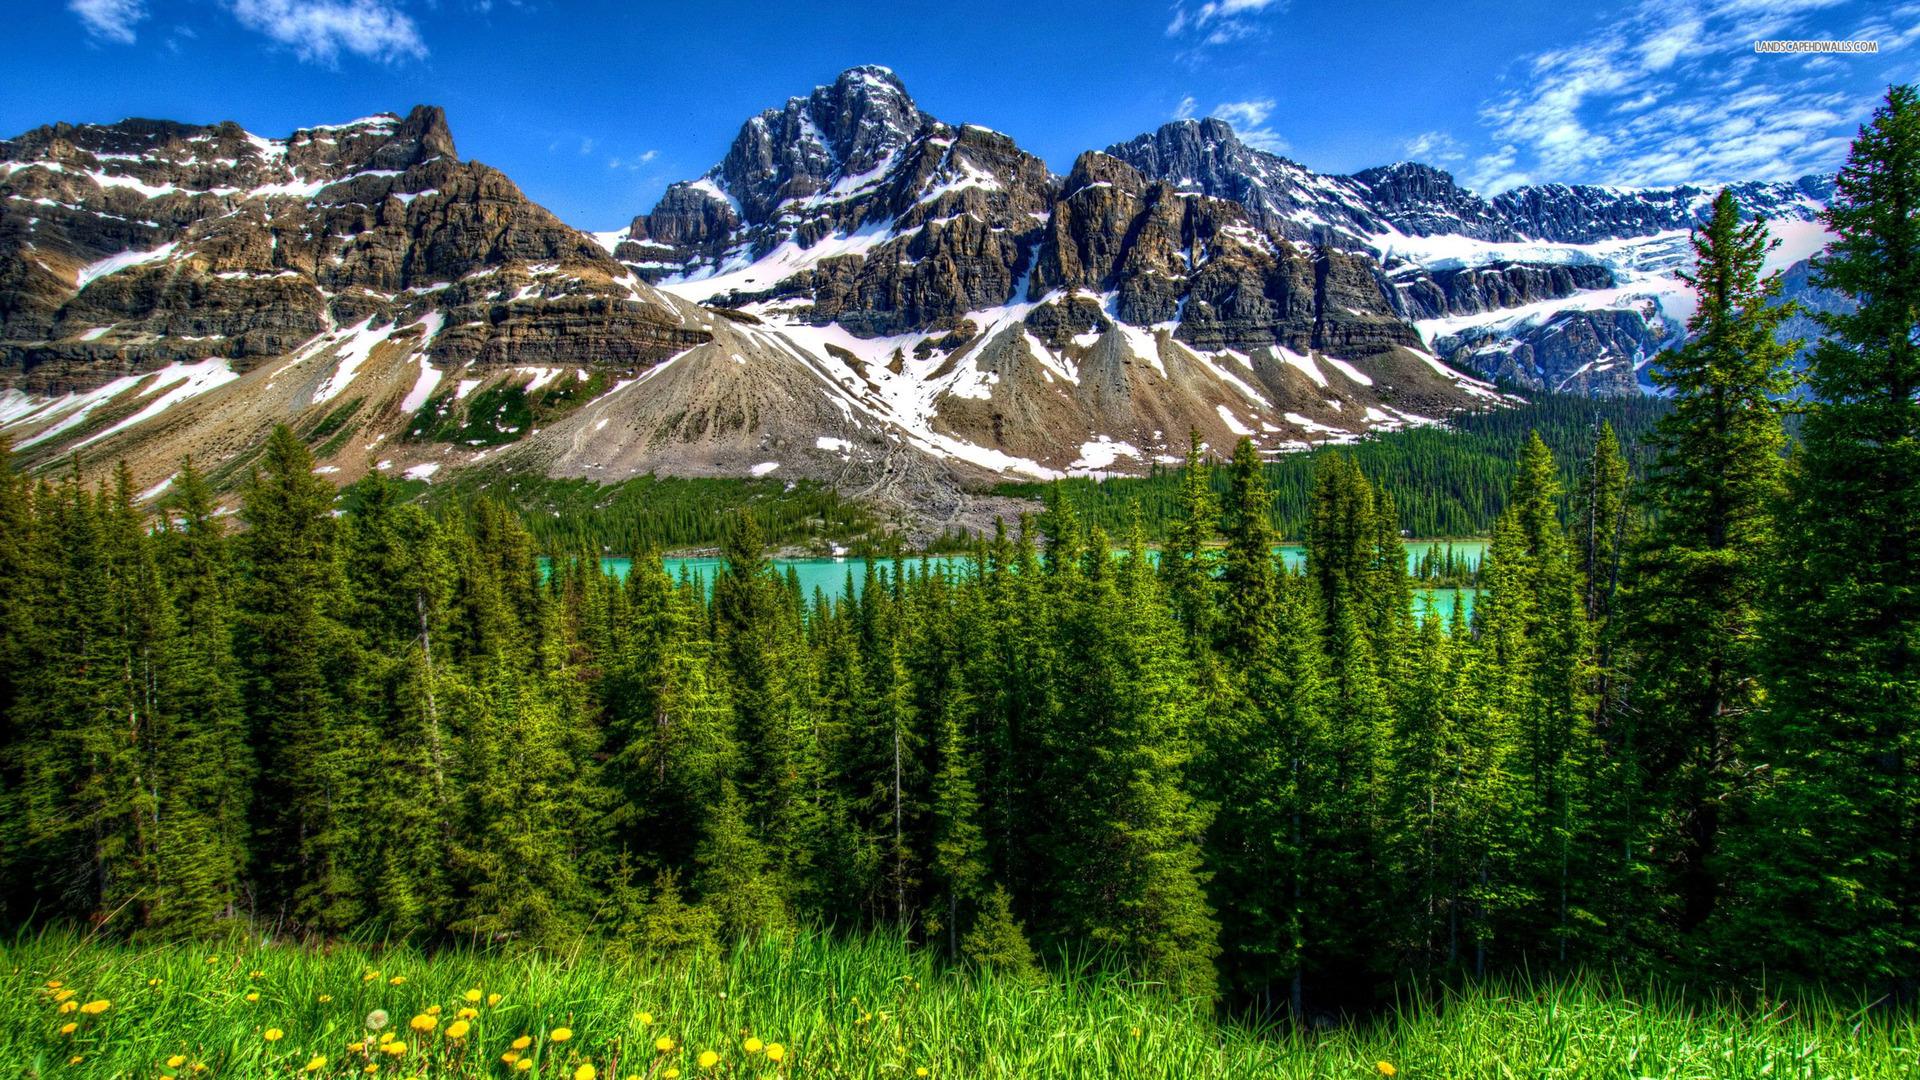 Download Nature Desktop Wallpapers 1920x1080 77 Pc Wallpaper